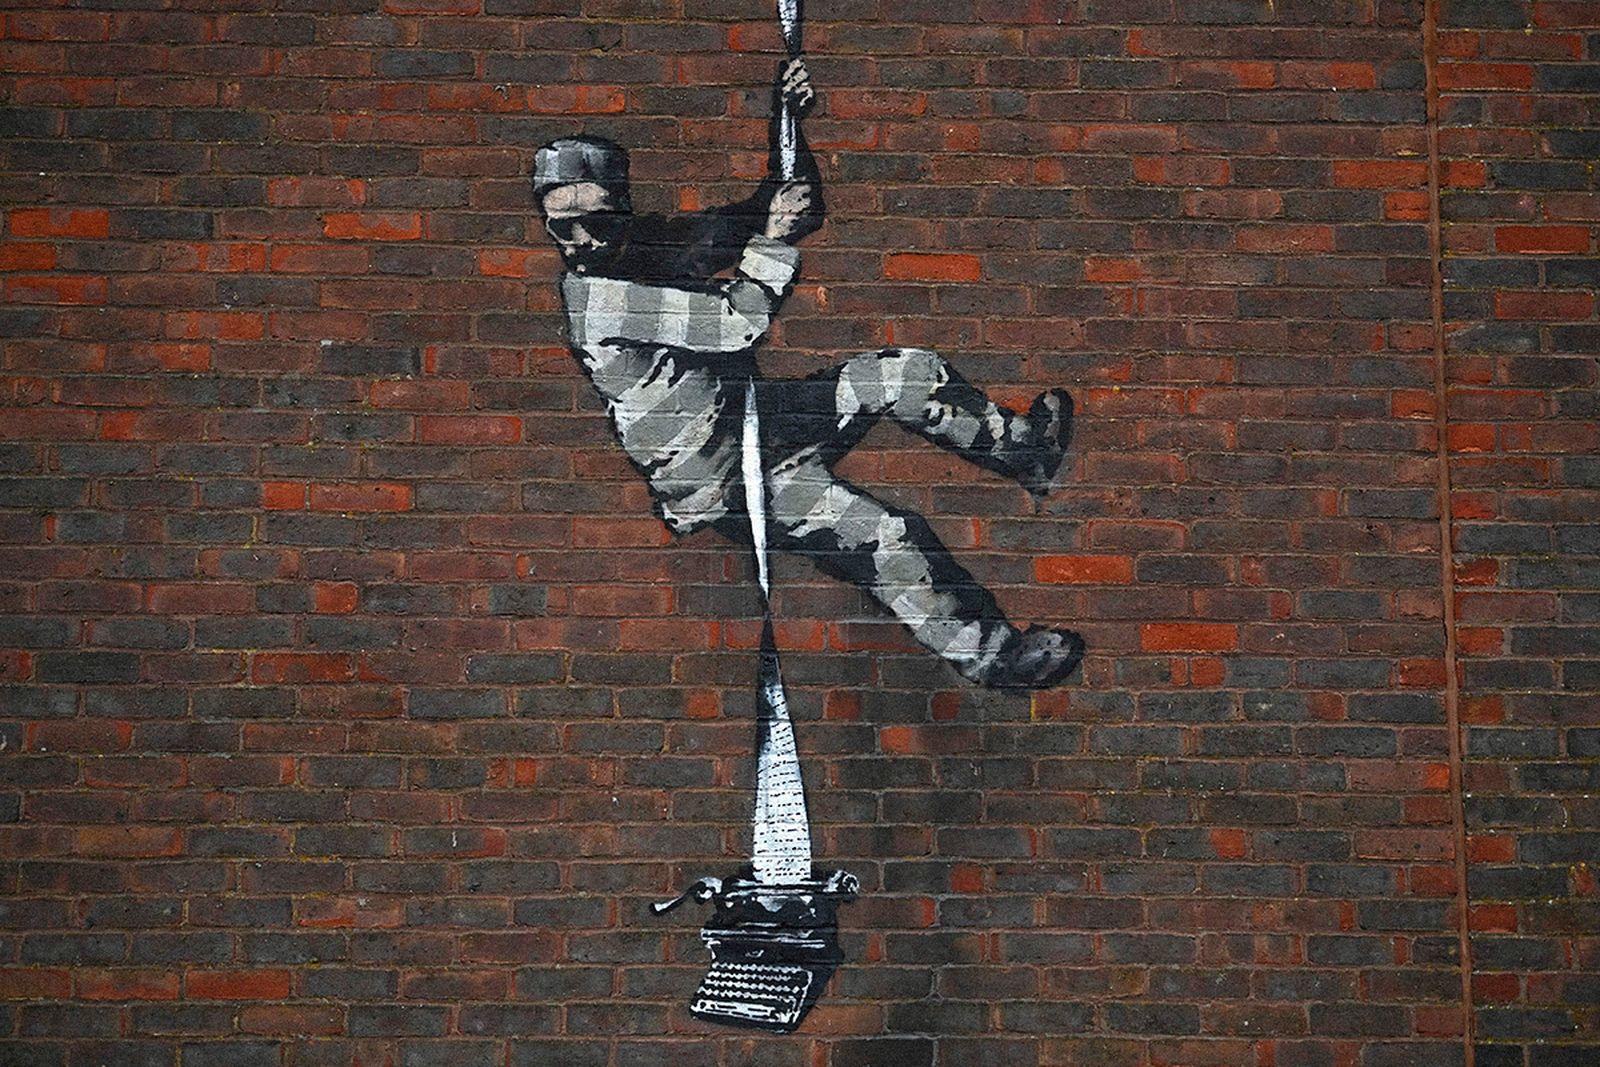 banksy-mural-vandalized-01